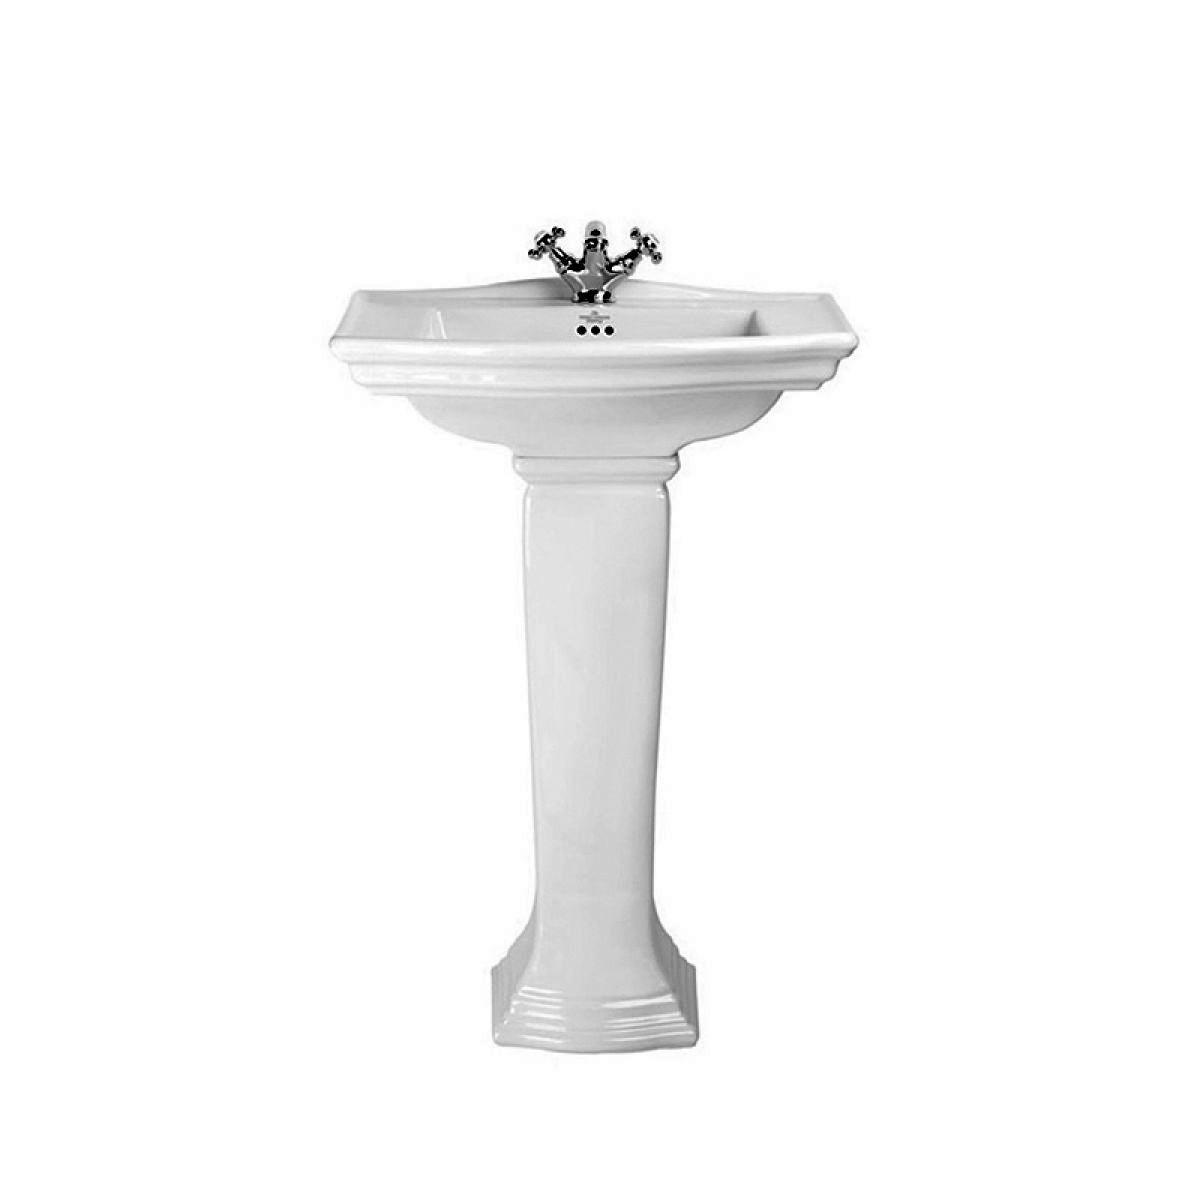 Bathrooms for sale uk - Imperial Westminster Bathroom Basin